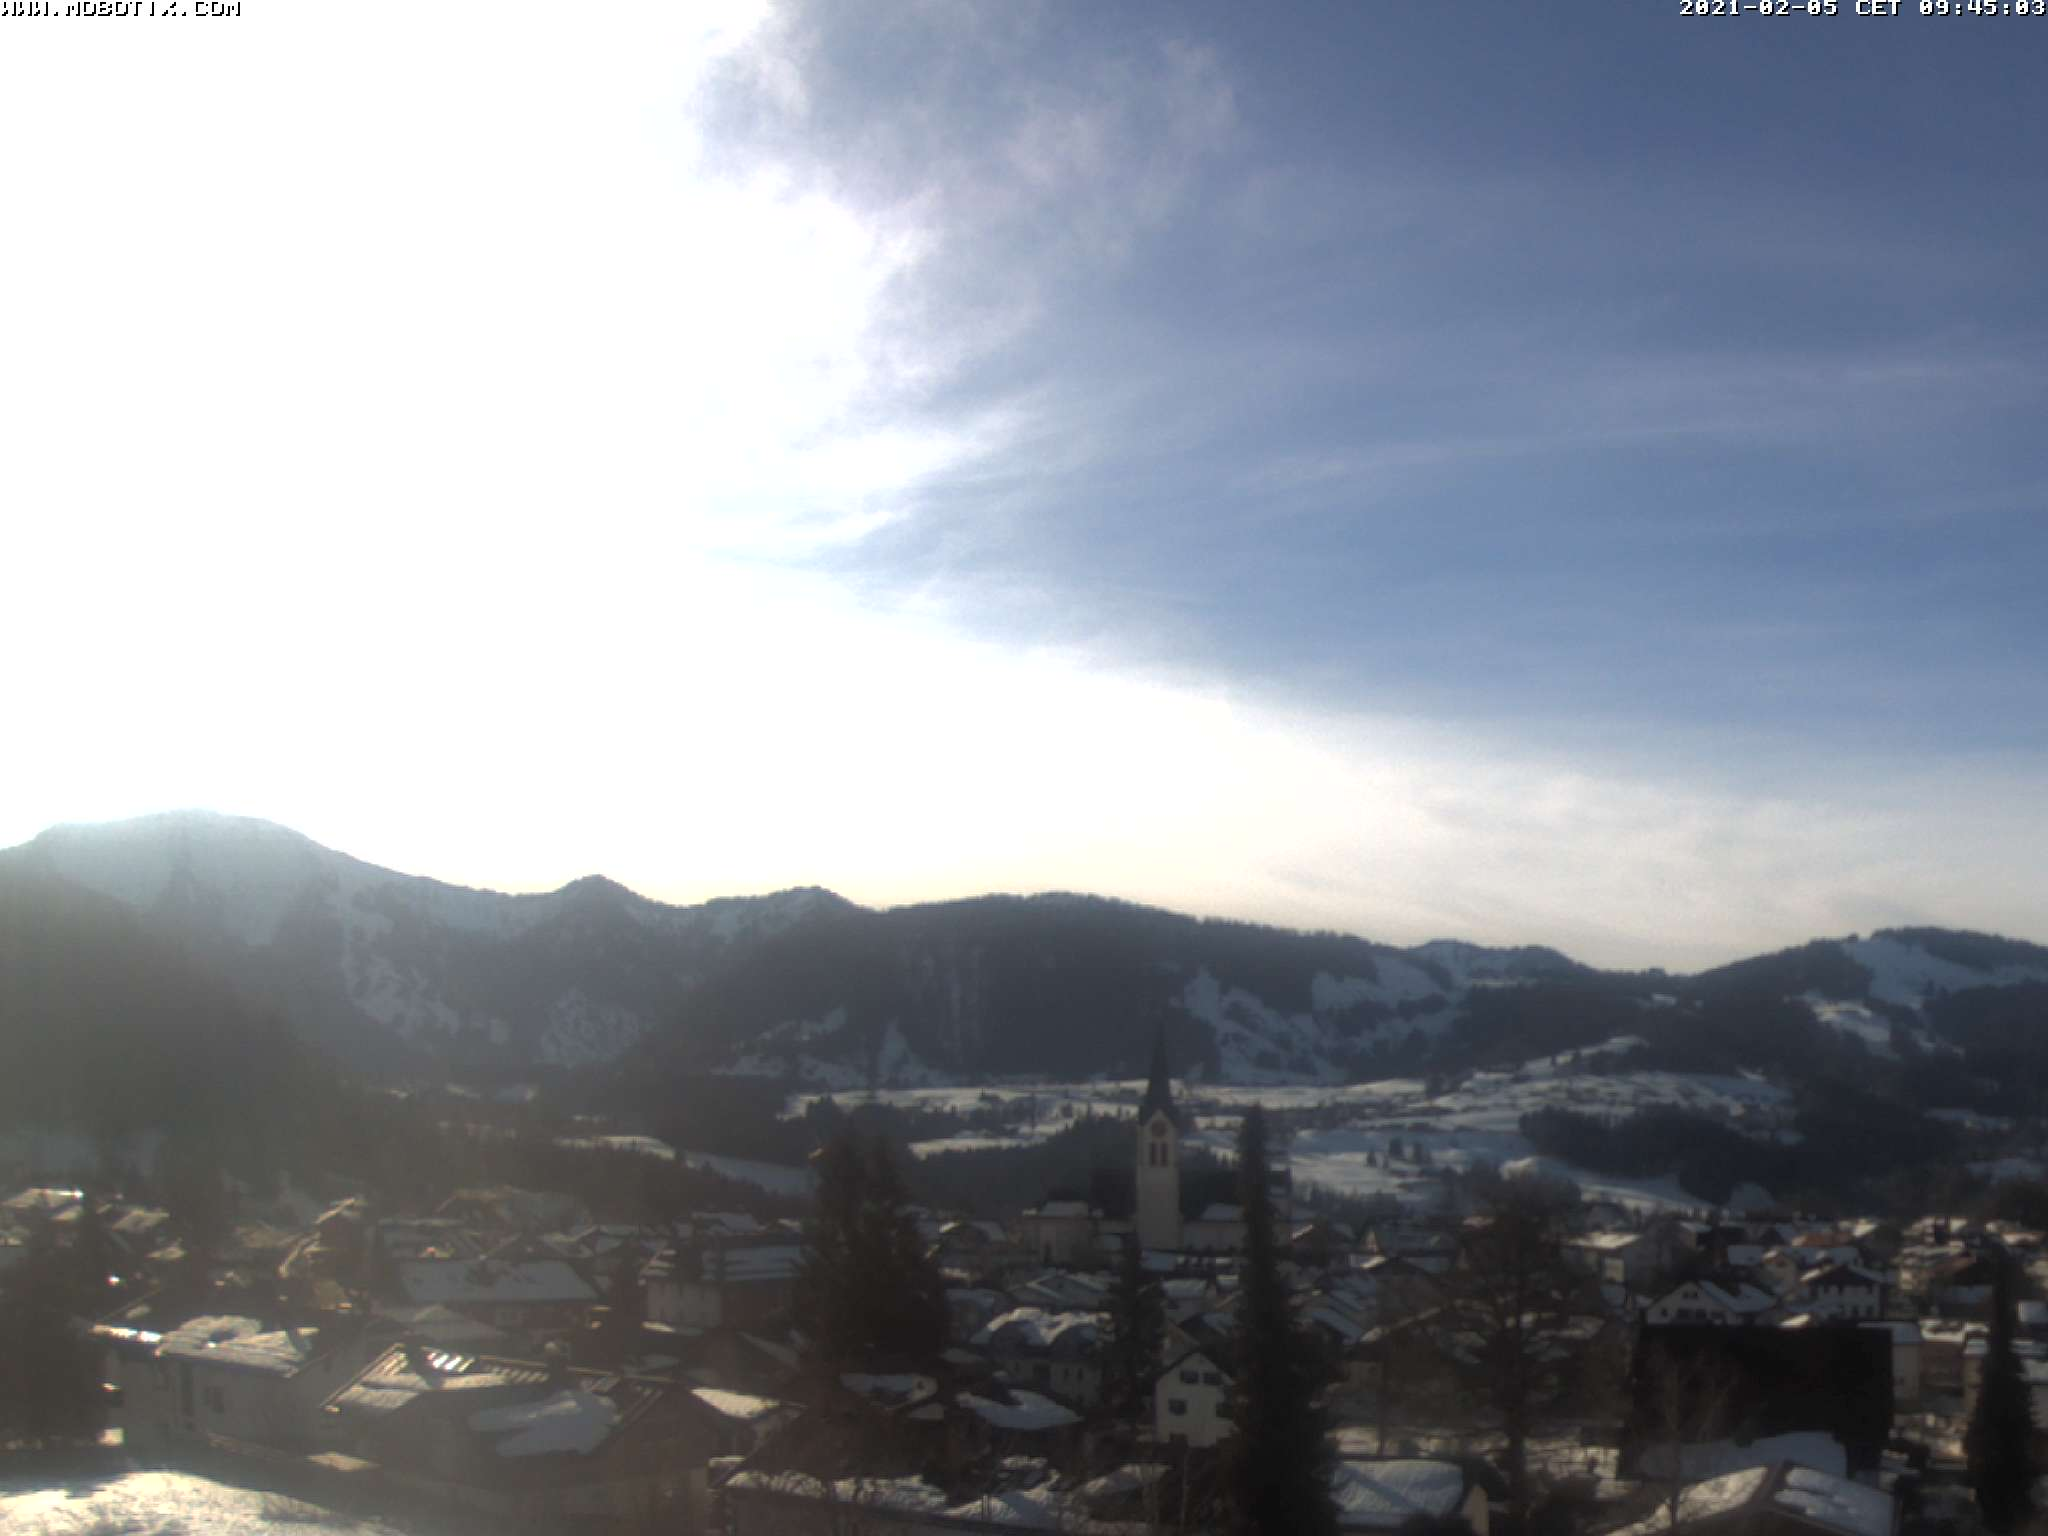 Webcam Skigebiet Oberstaufen - Hochgrat cam 3 - Allgäu